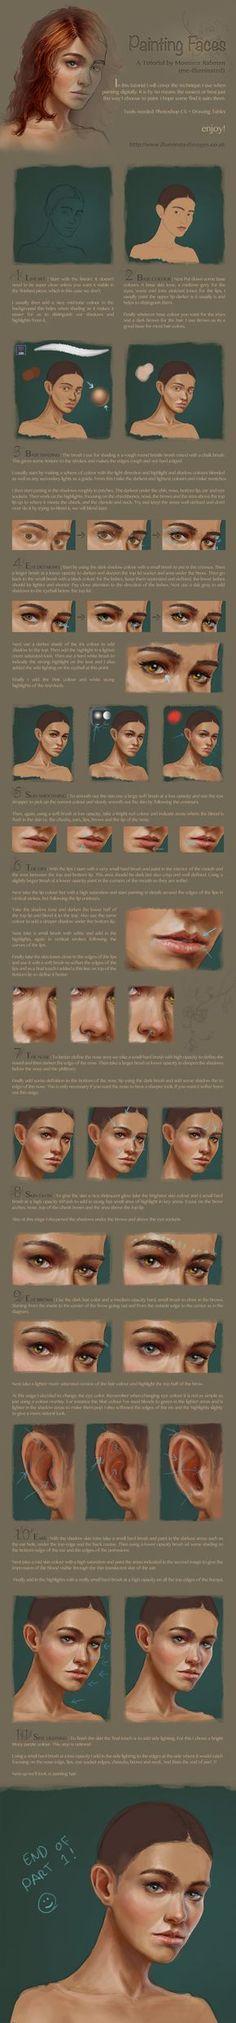 Digital face / portrait painting tutorial part 1 by *me-illuminated on deviantART